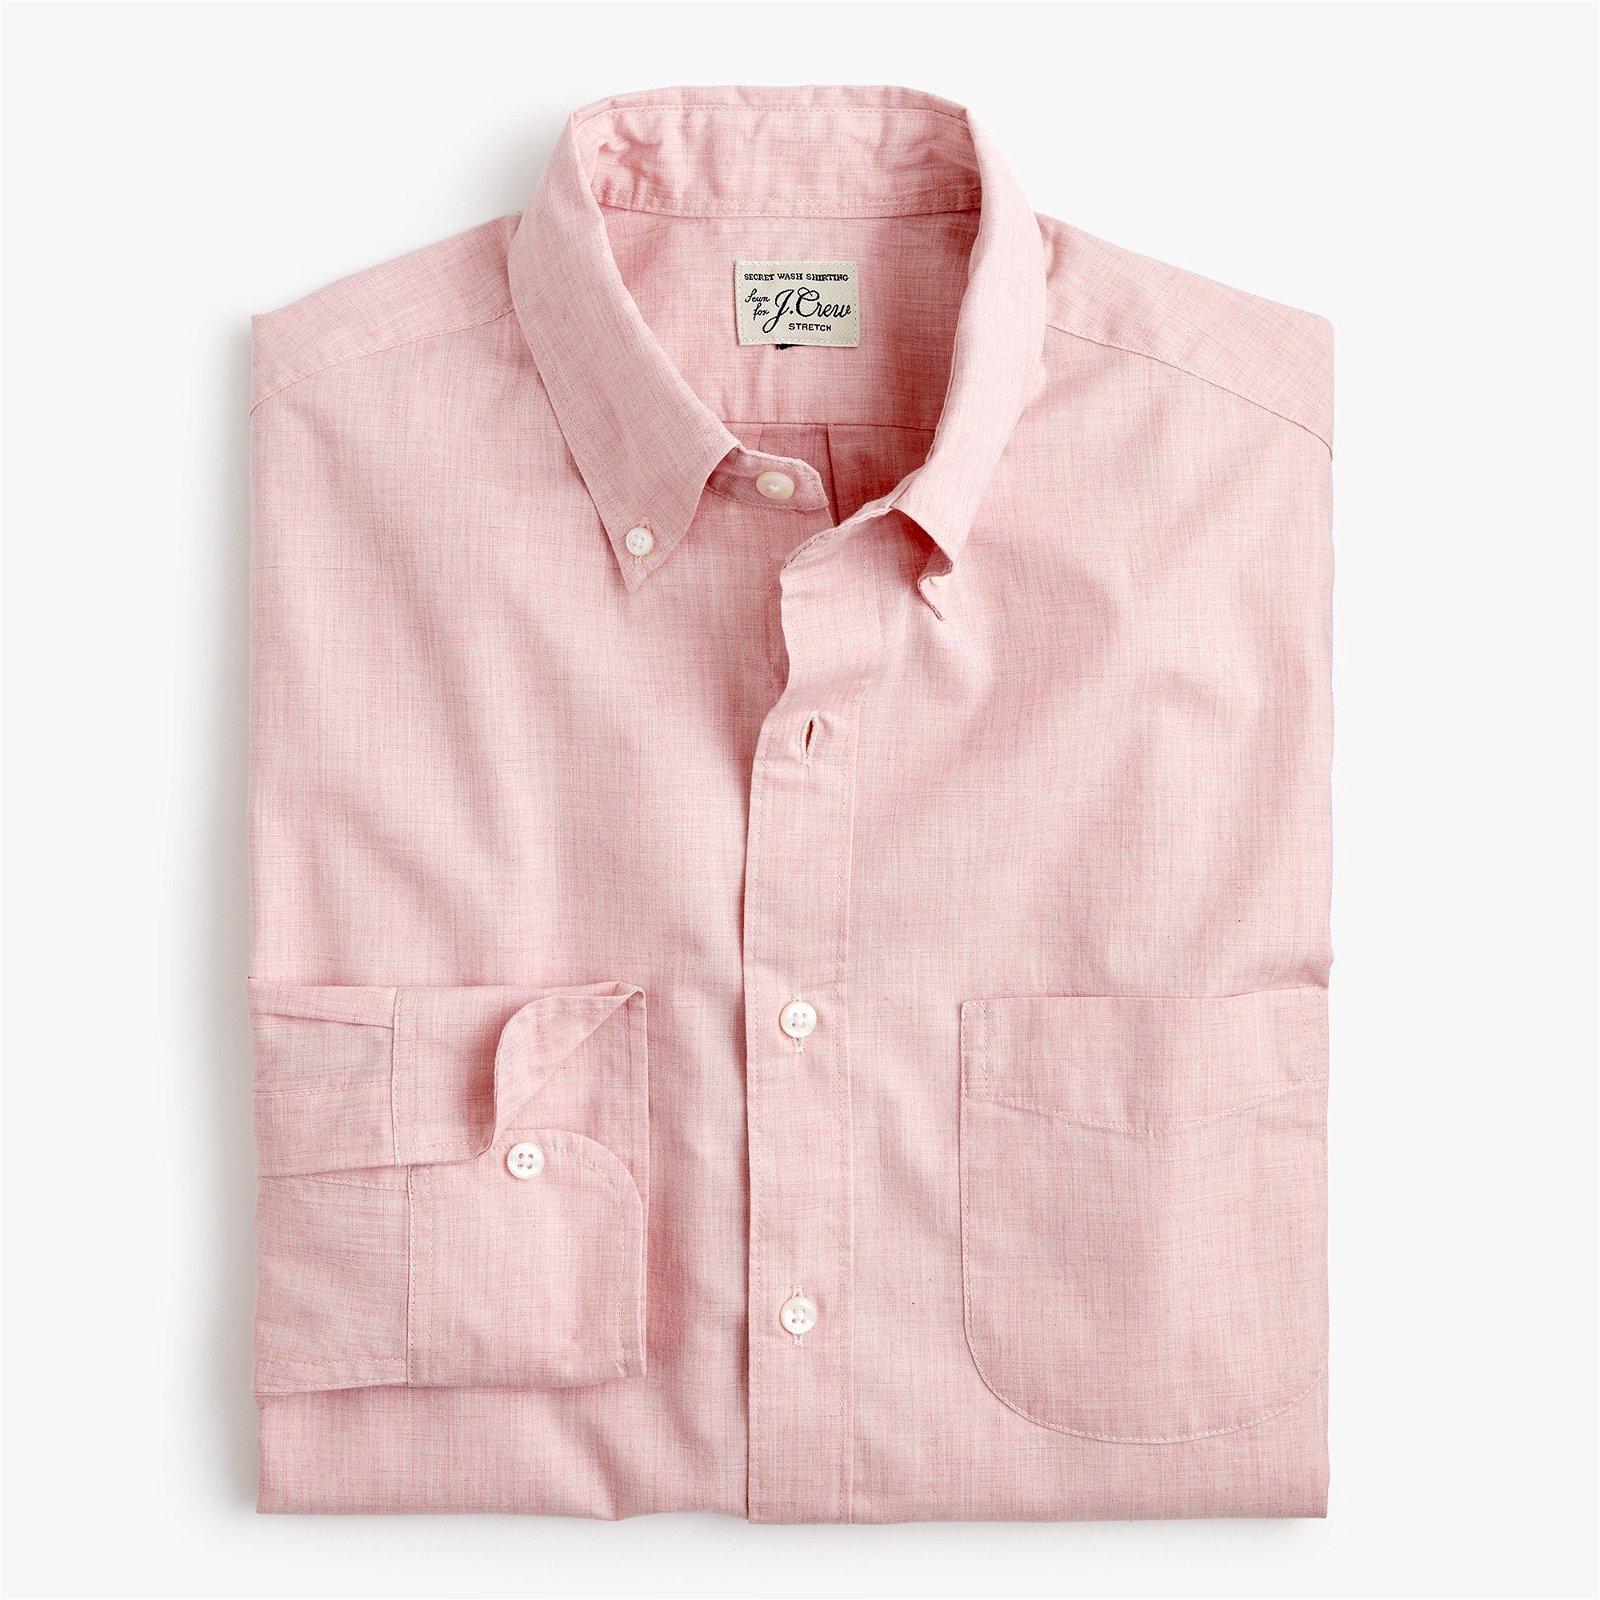 Untucked stretch secret Wash shirt in solid heathered poplin